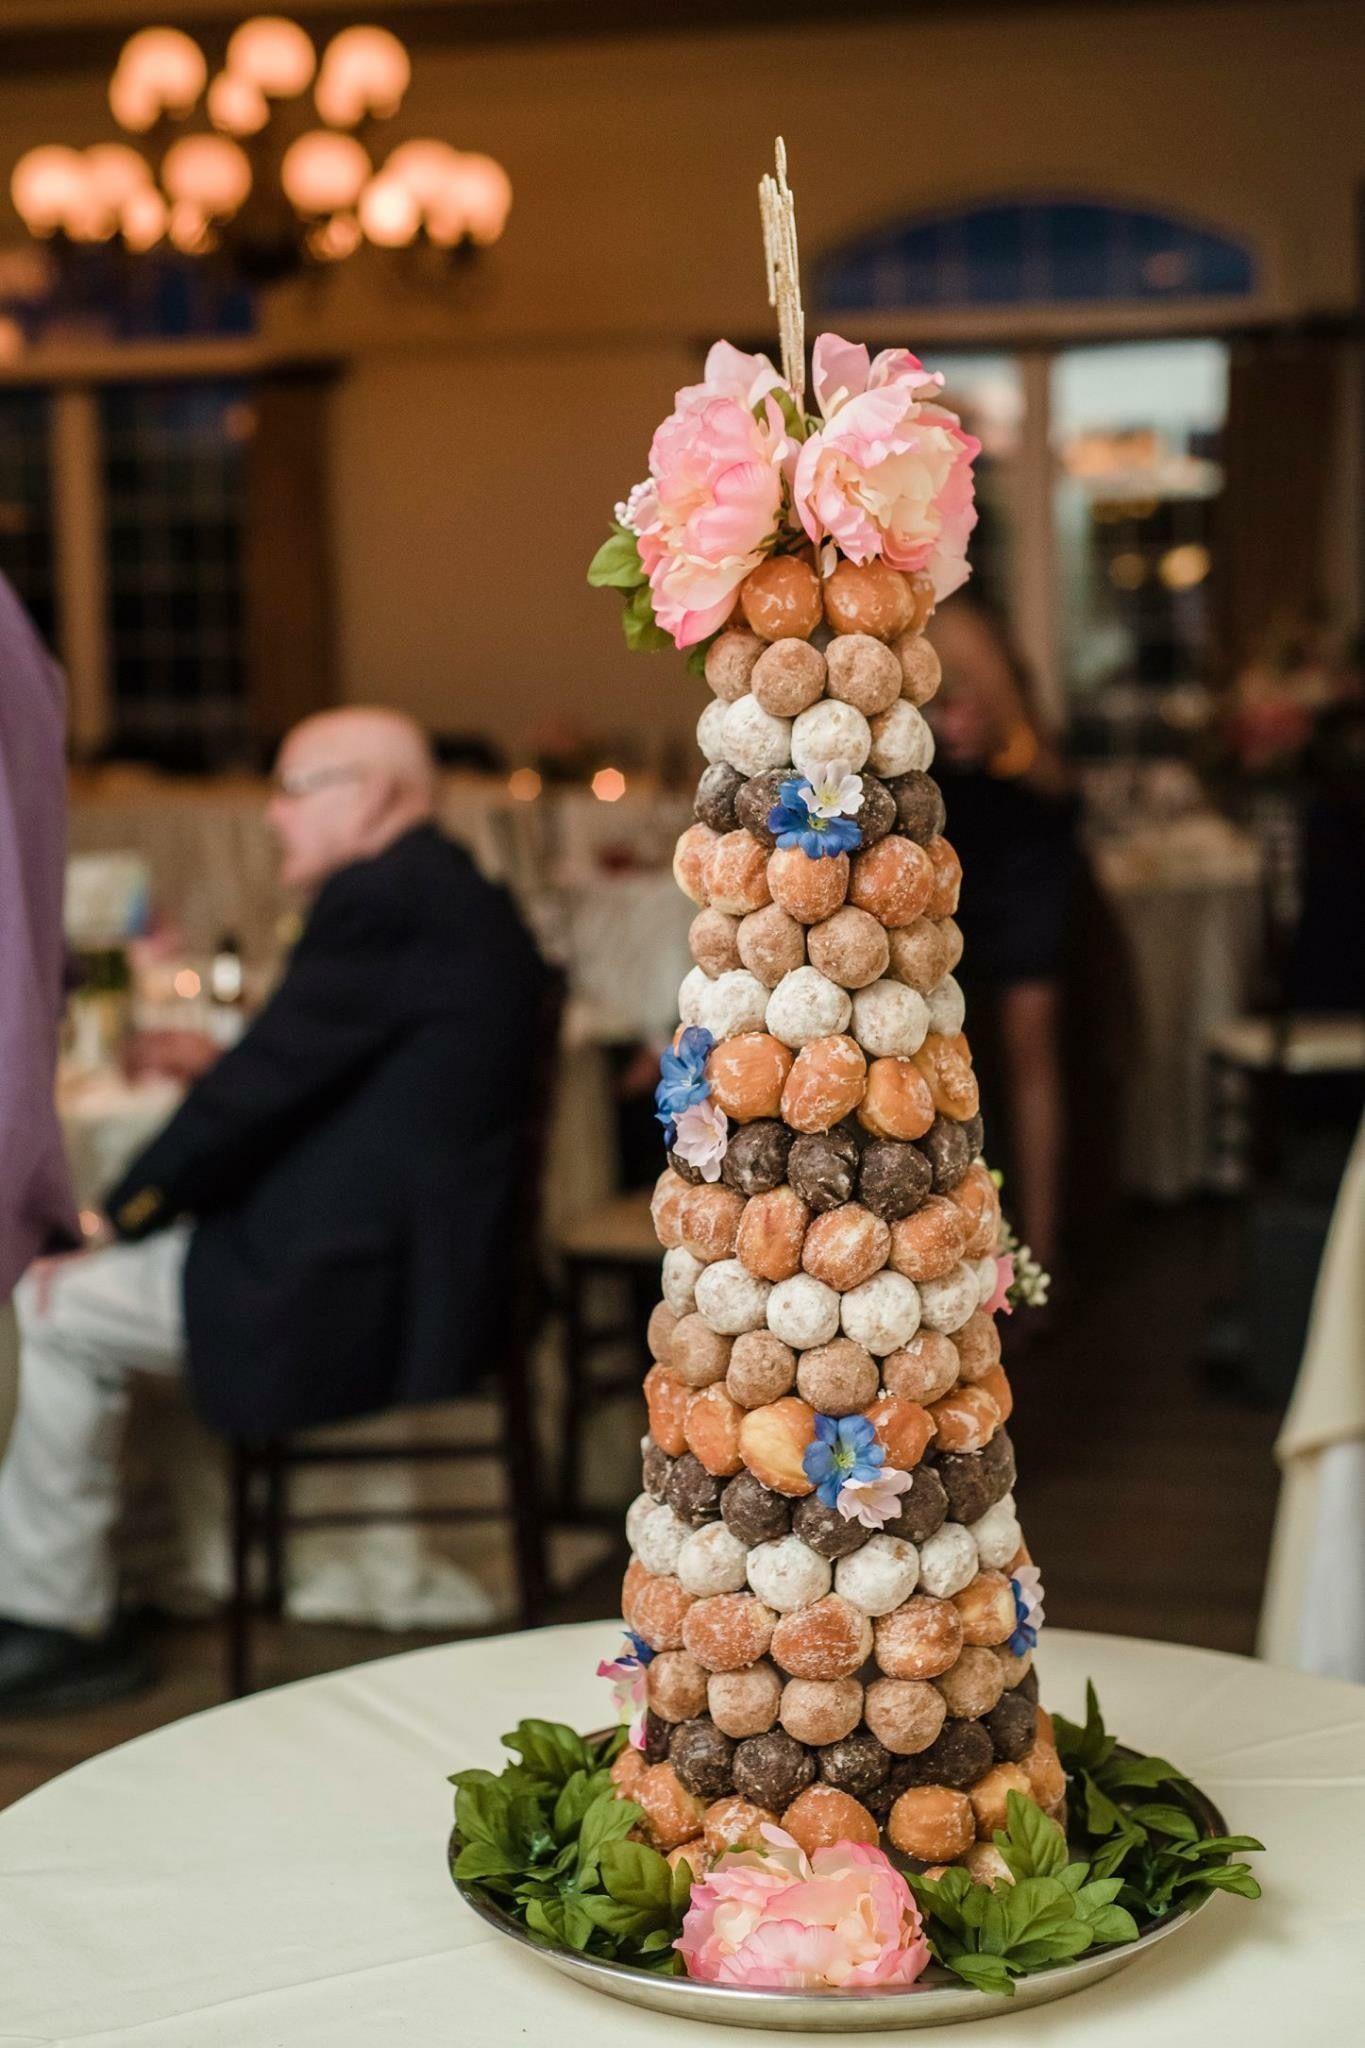 Donut hole tower great wedding cake alternative